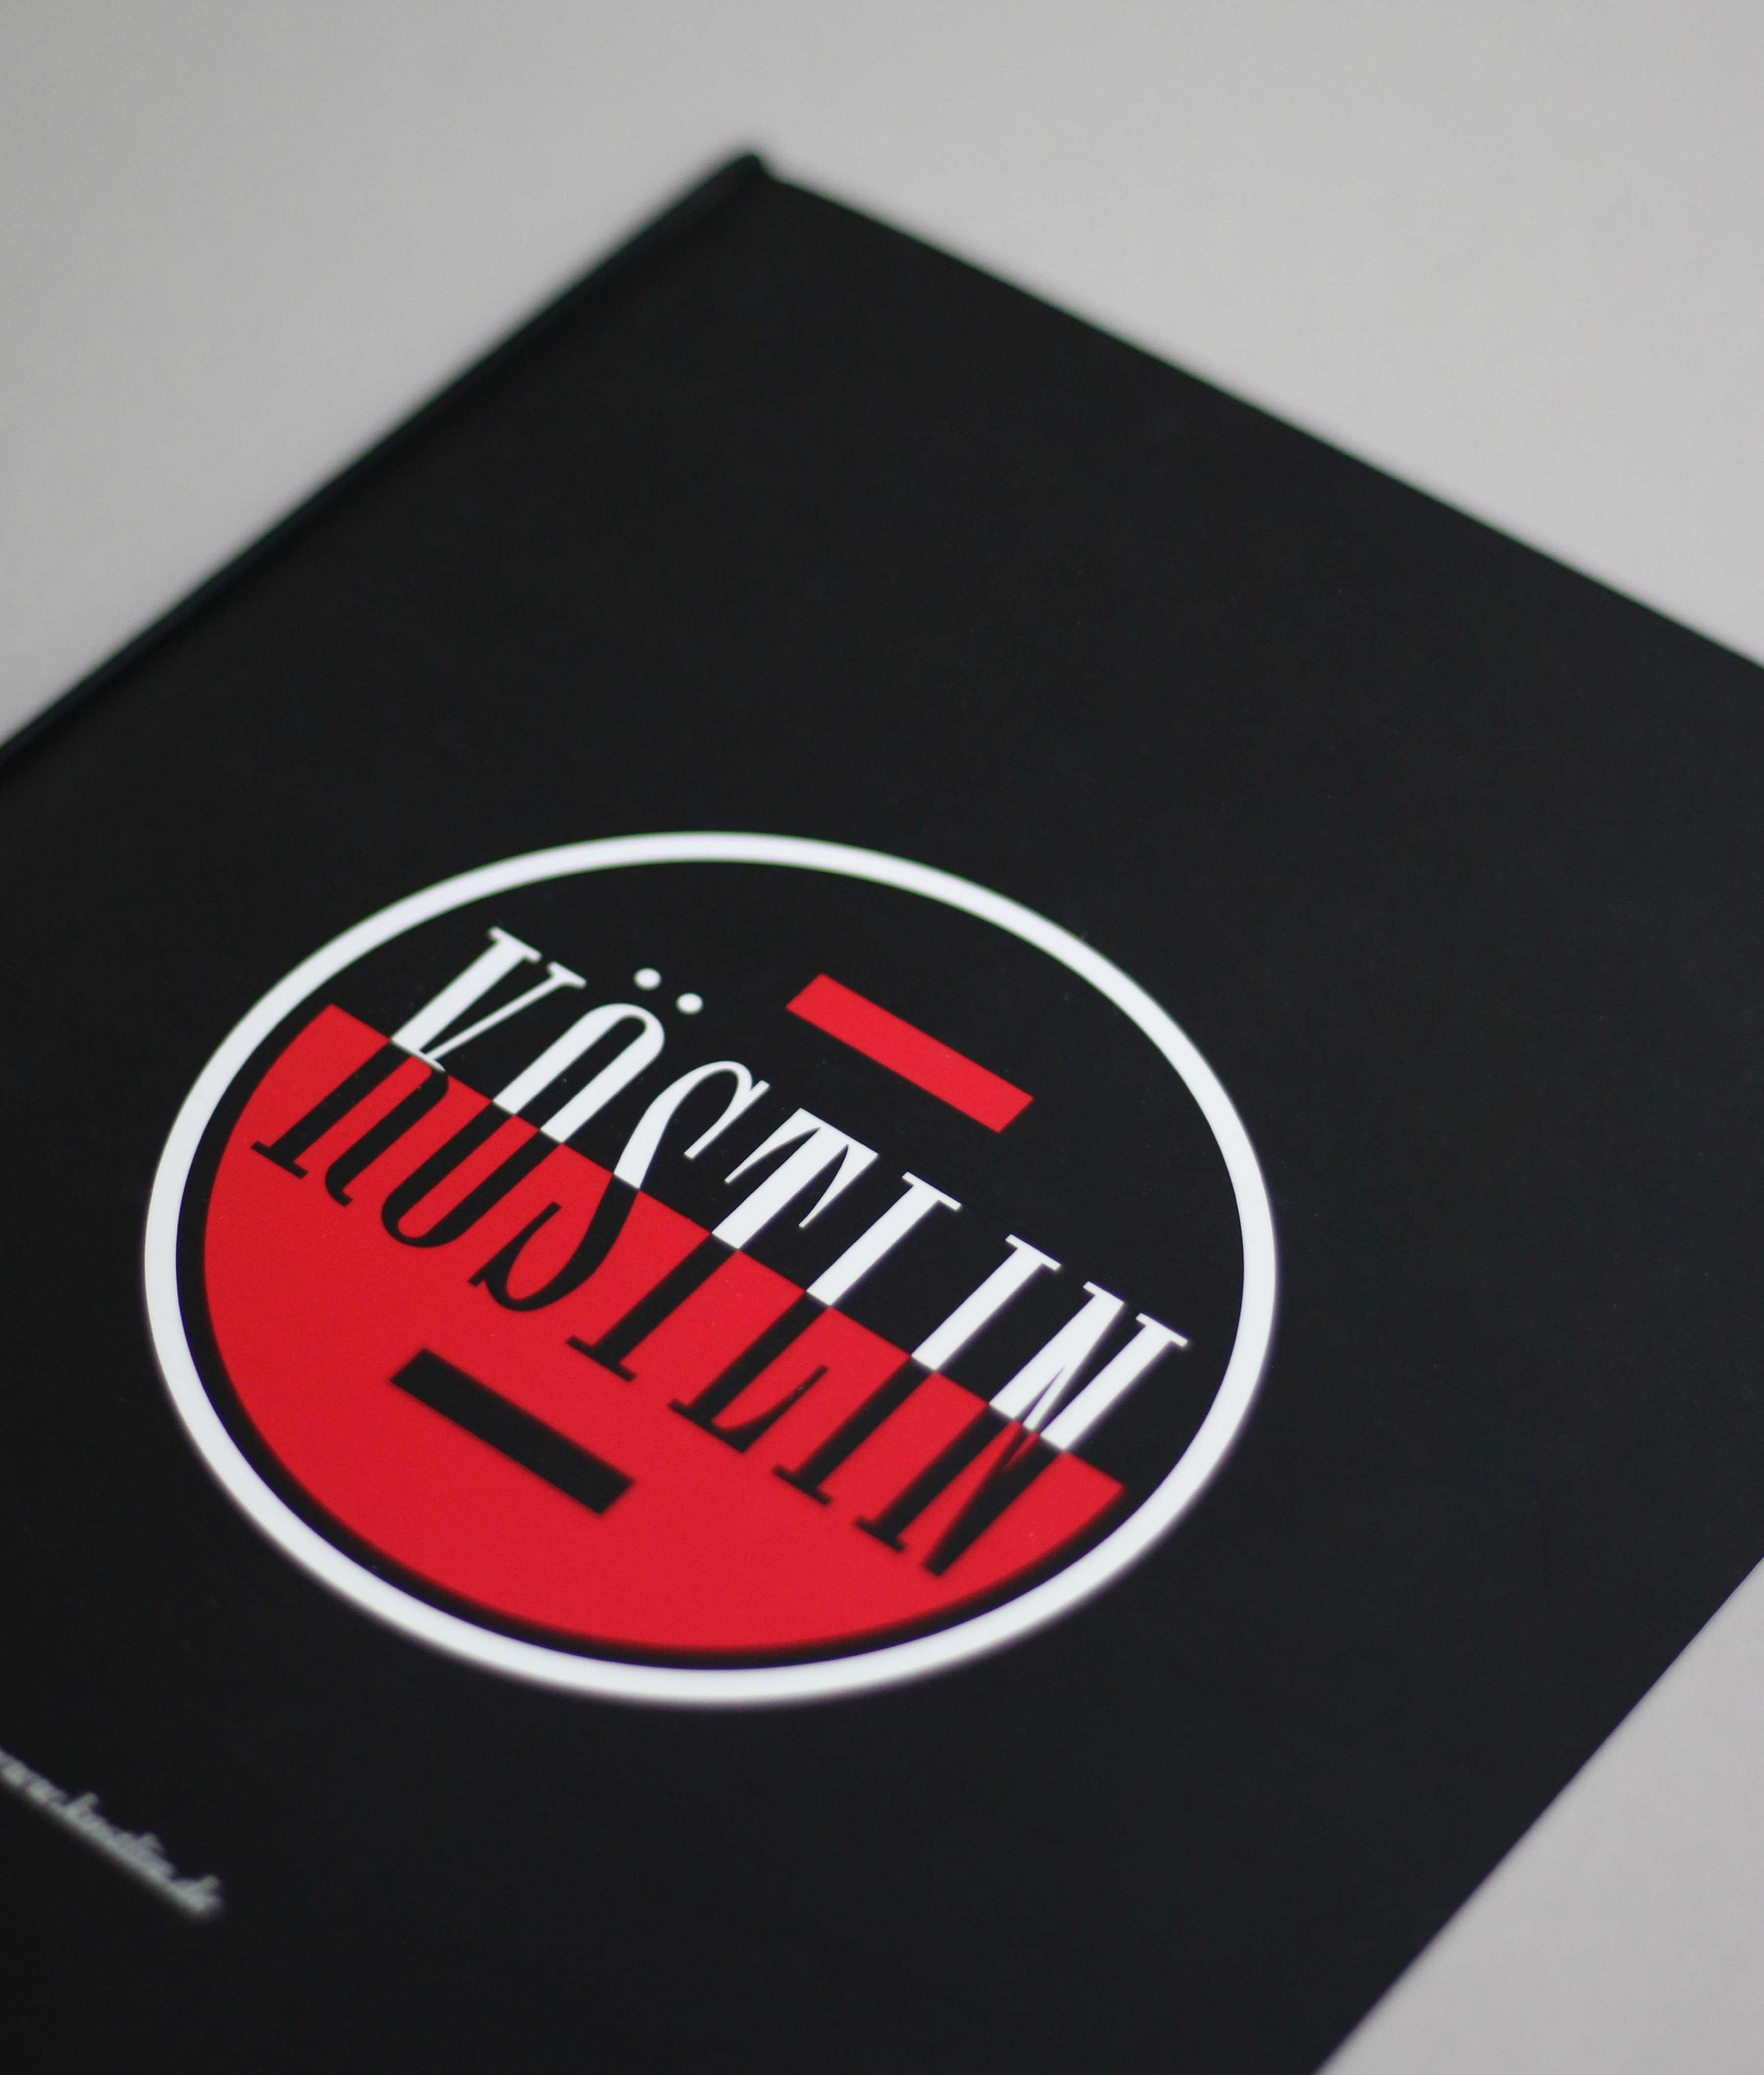 Imagebroschüre Cover Design